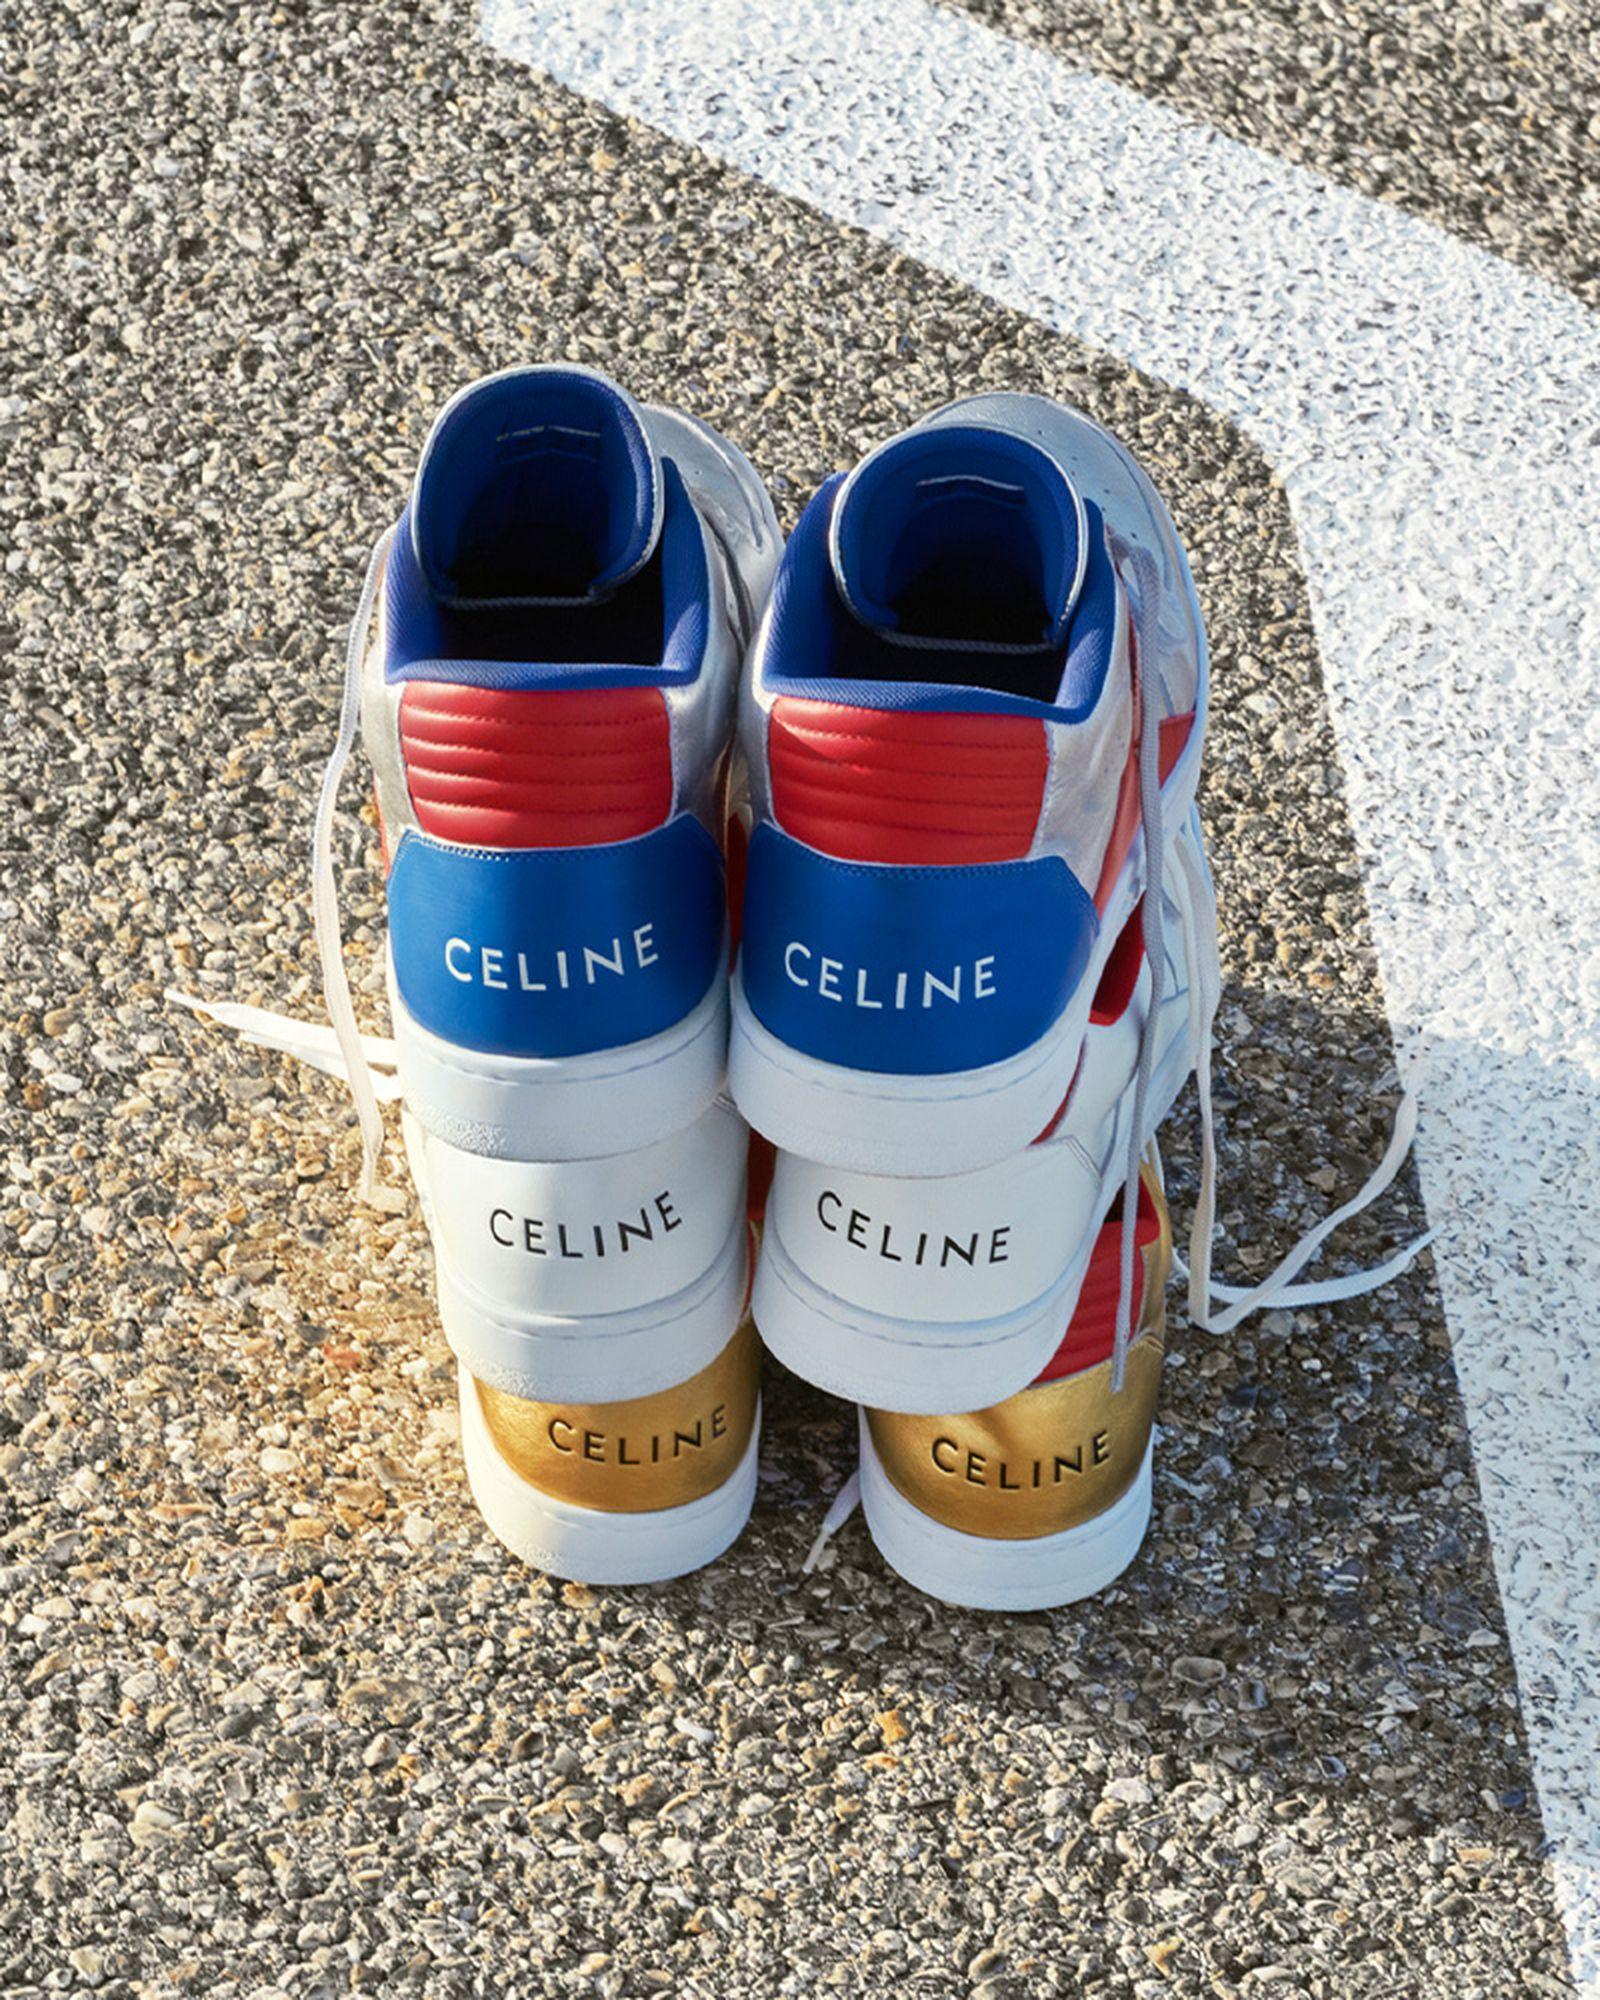 celine-trainer-1-release-date-price-03